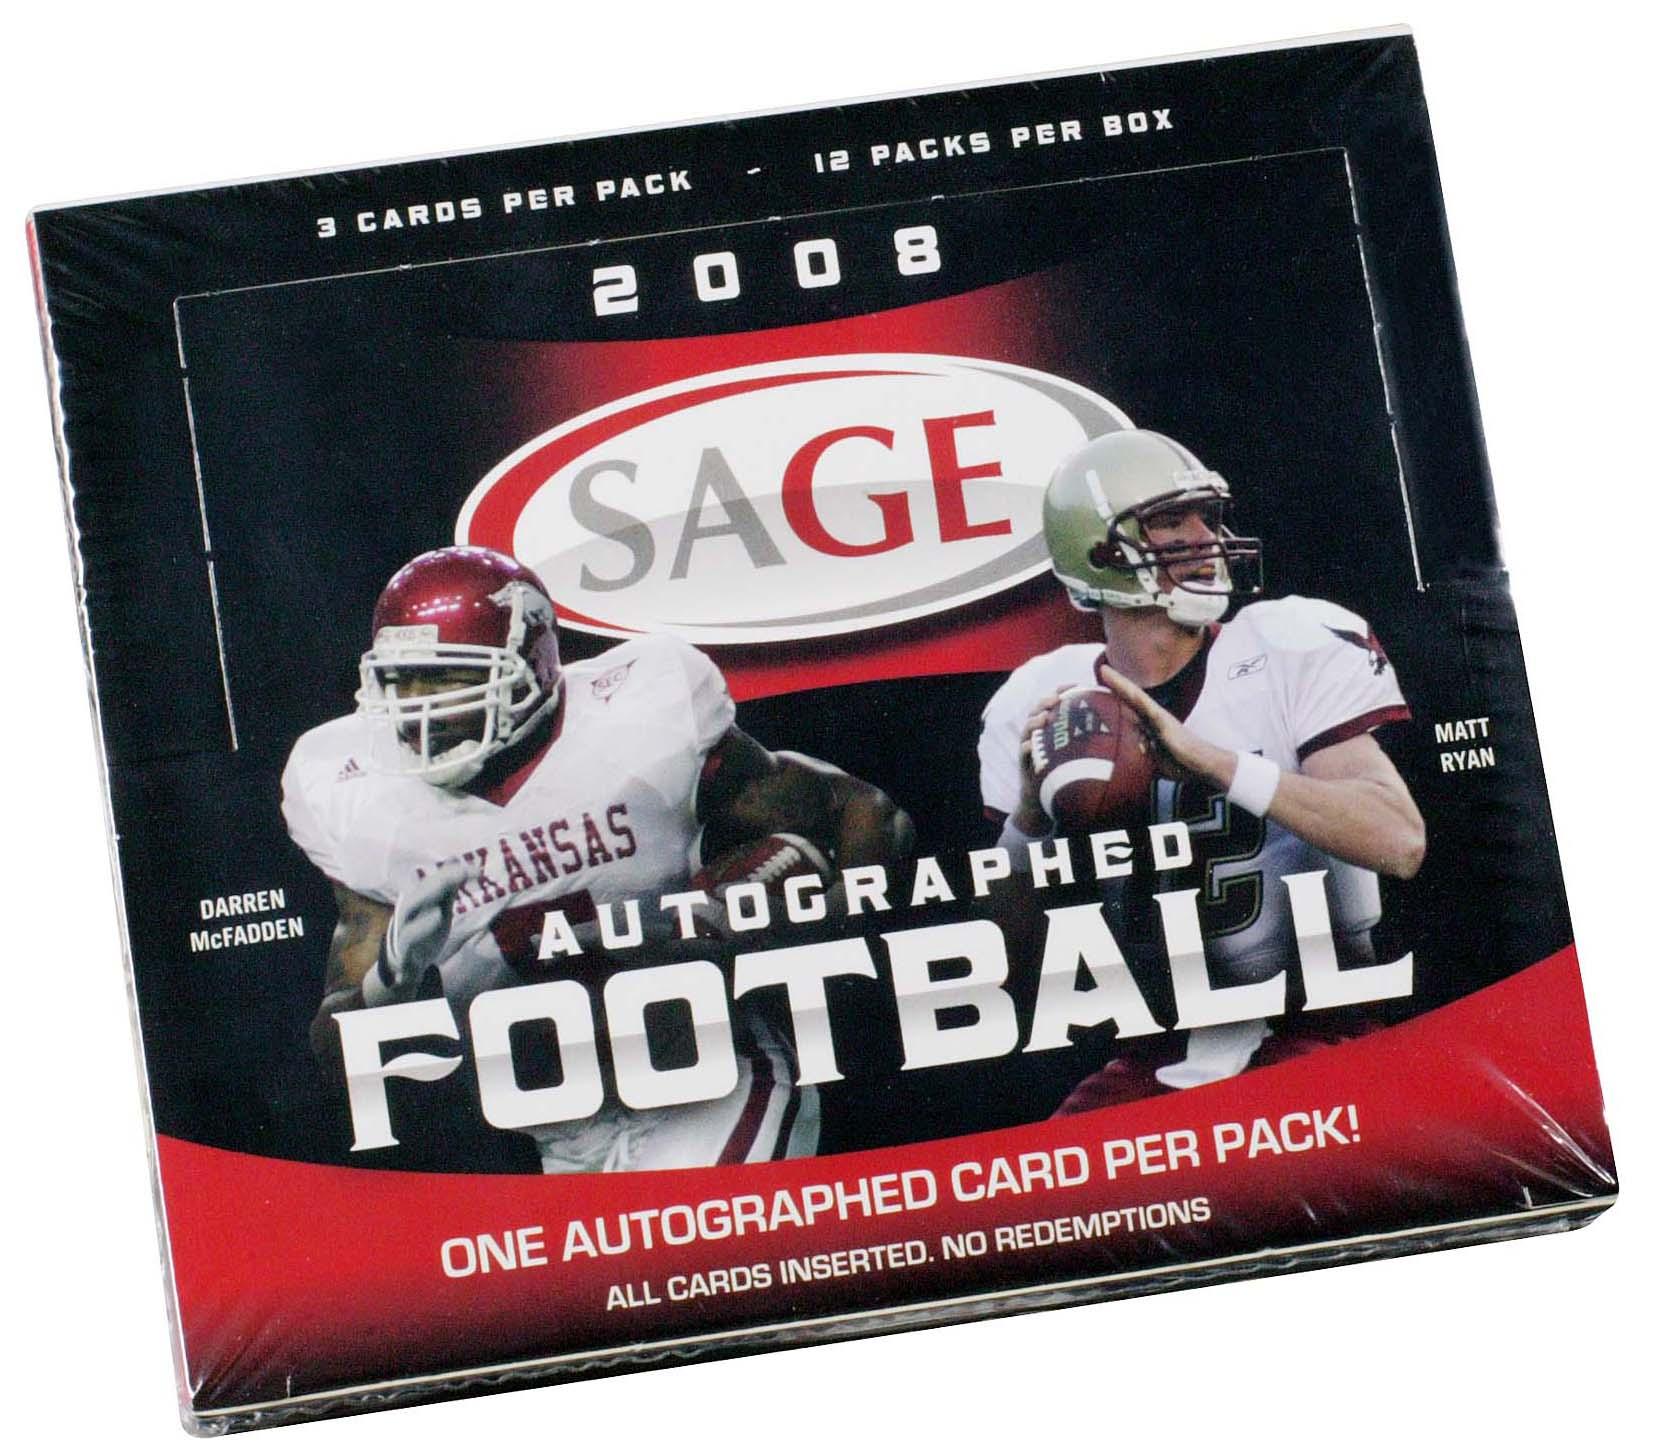 2008 SAGE Football Hobby Box